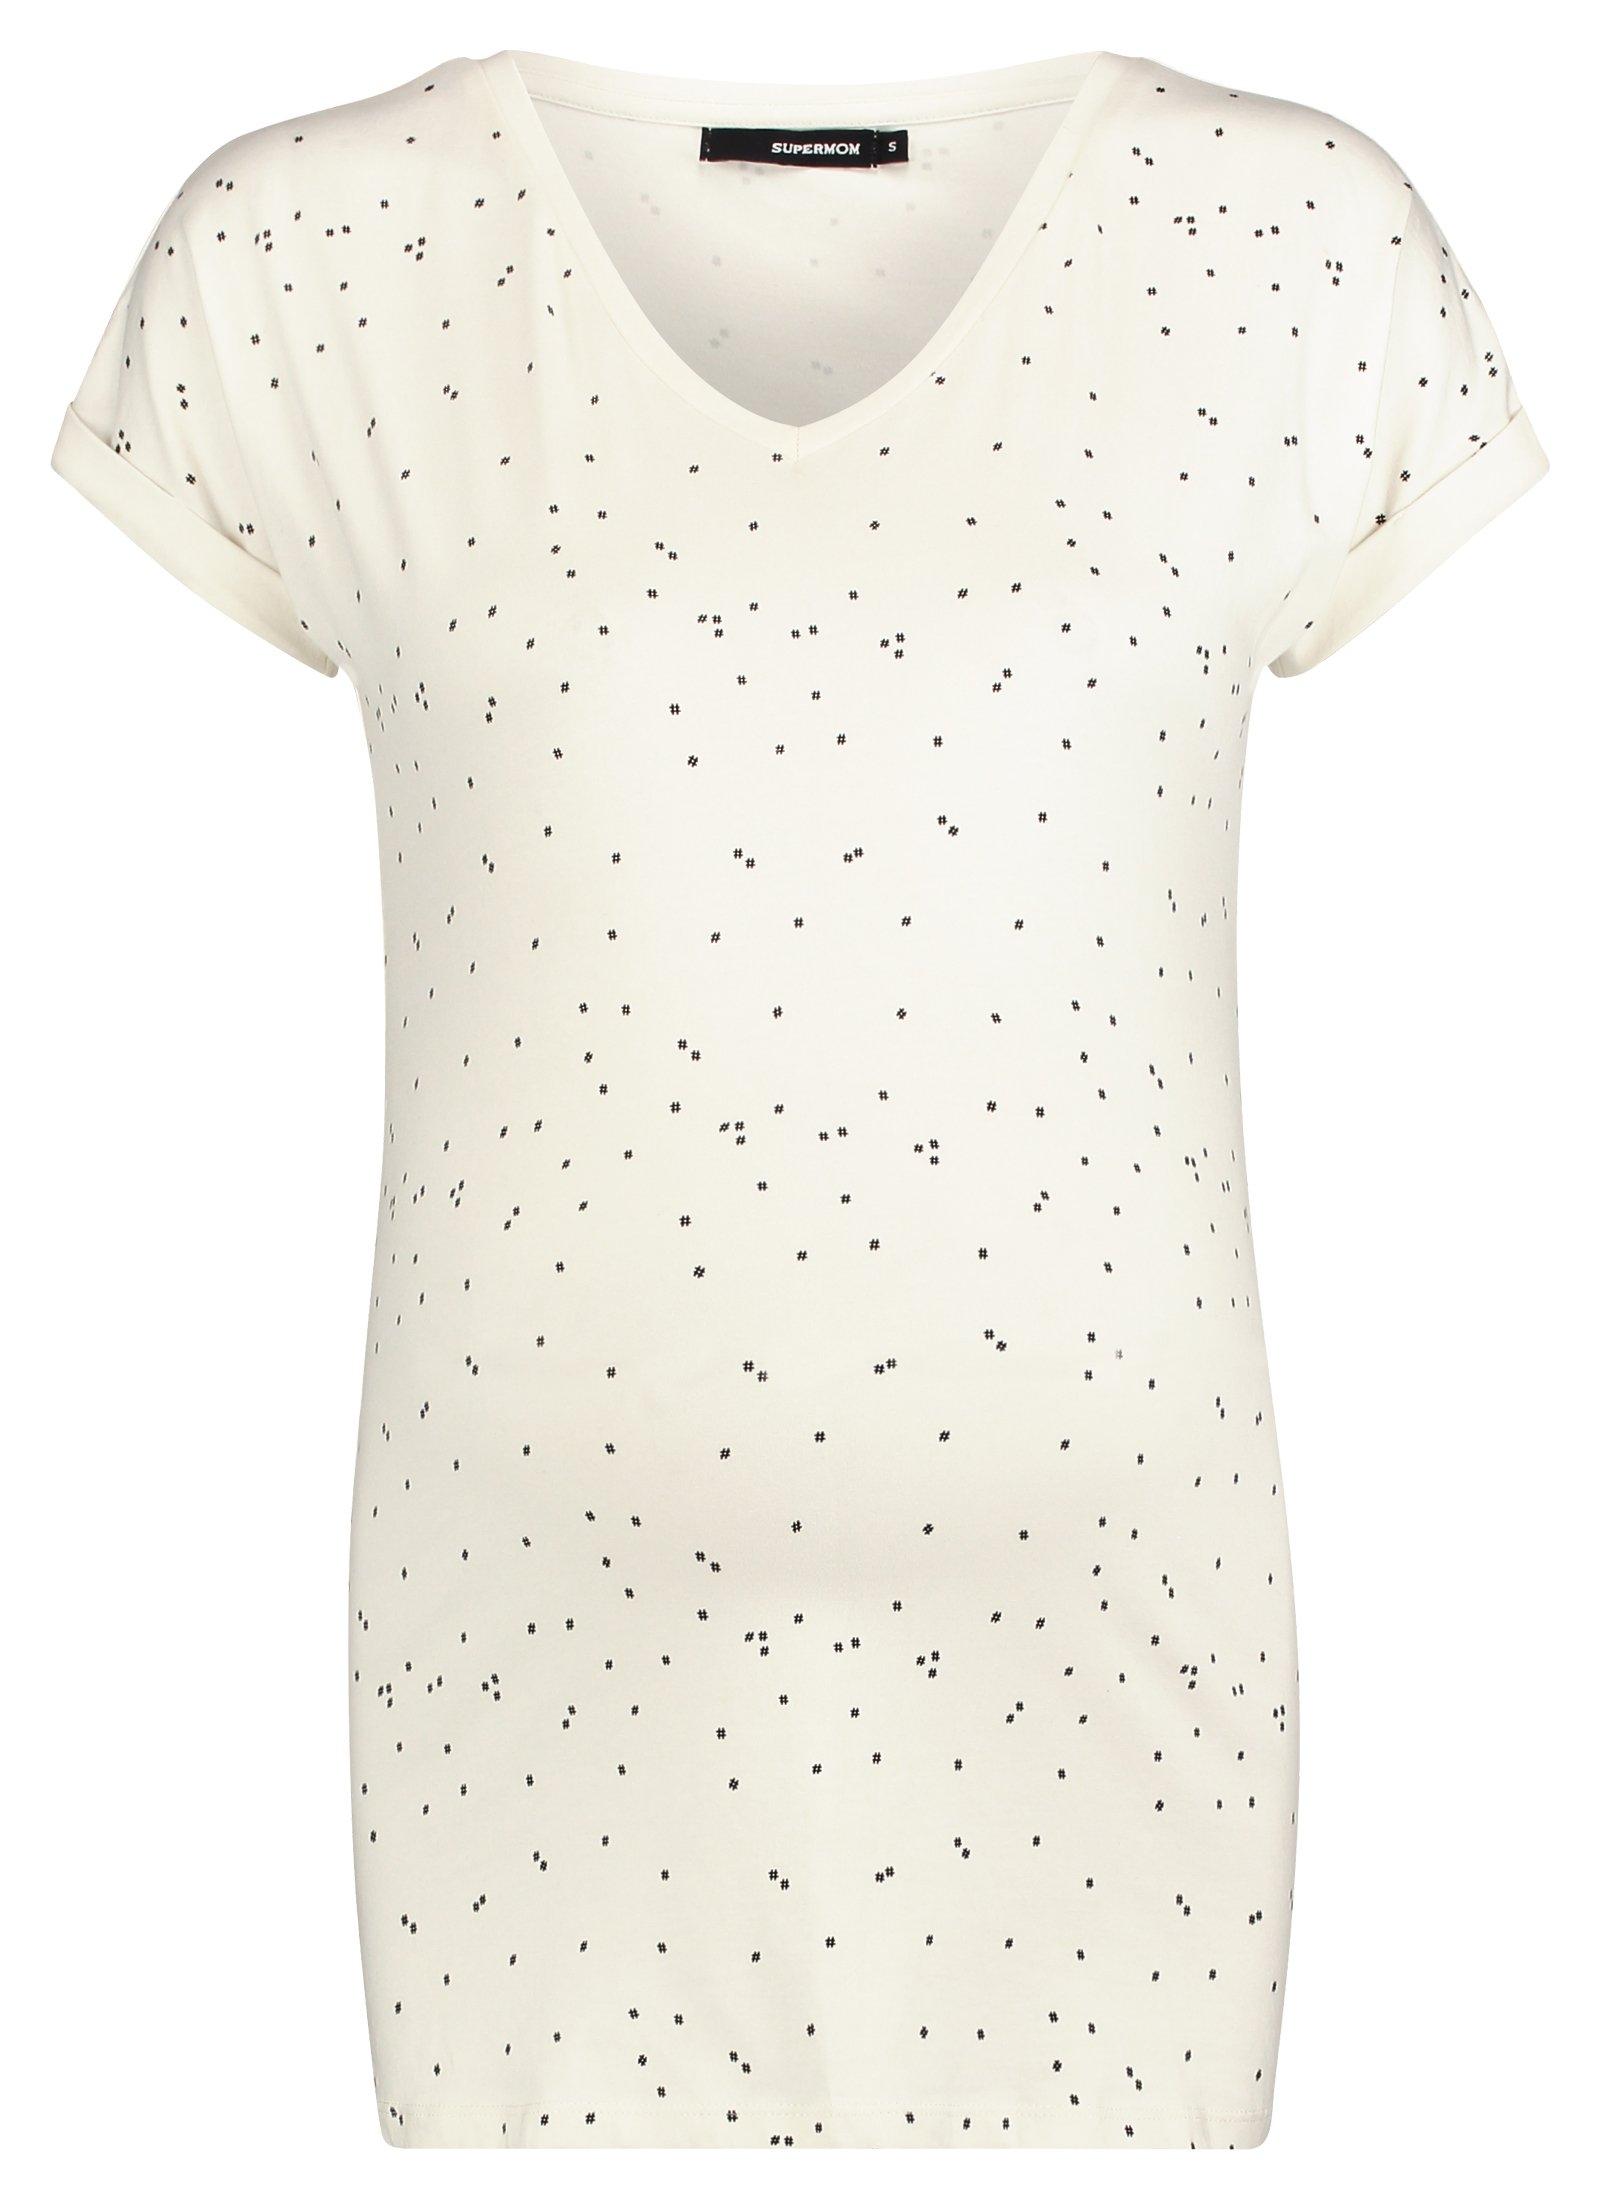 Supermom T-shirt »Hashtack« - gratis ruilen op otto.nl